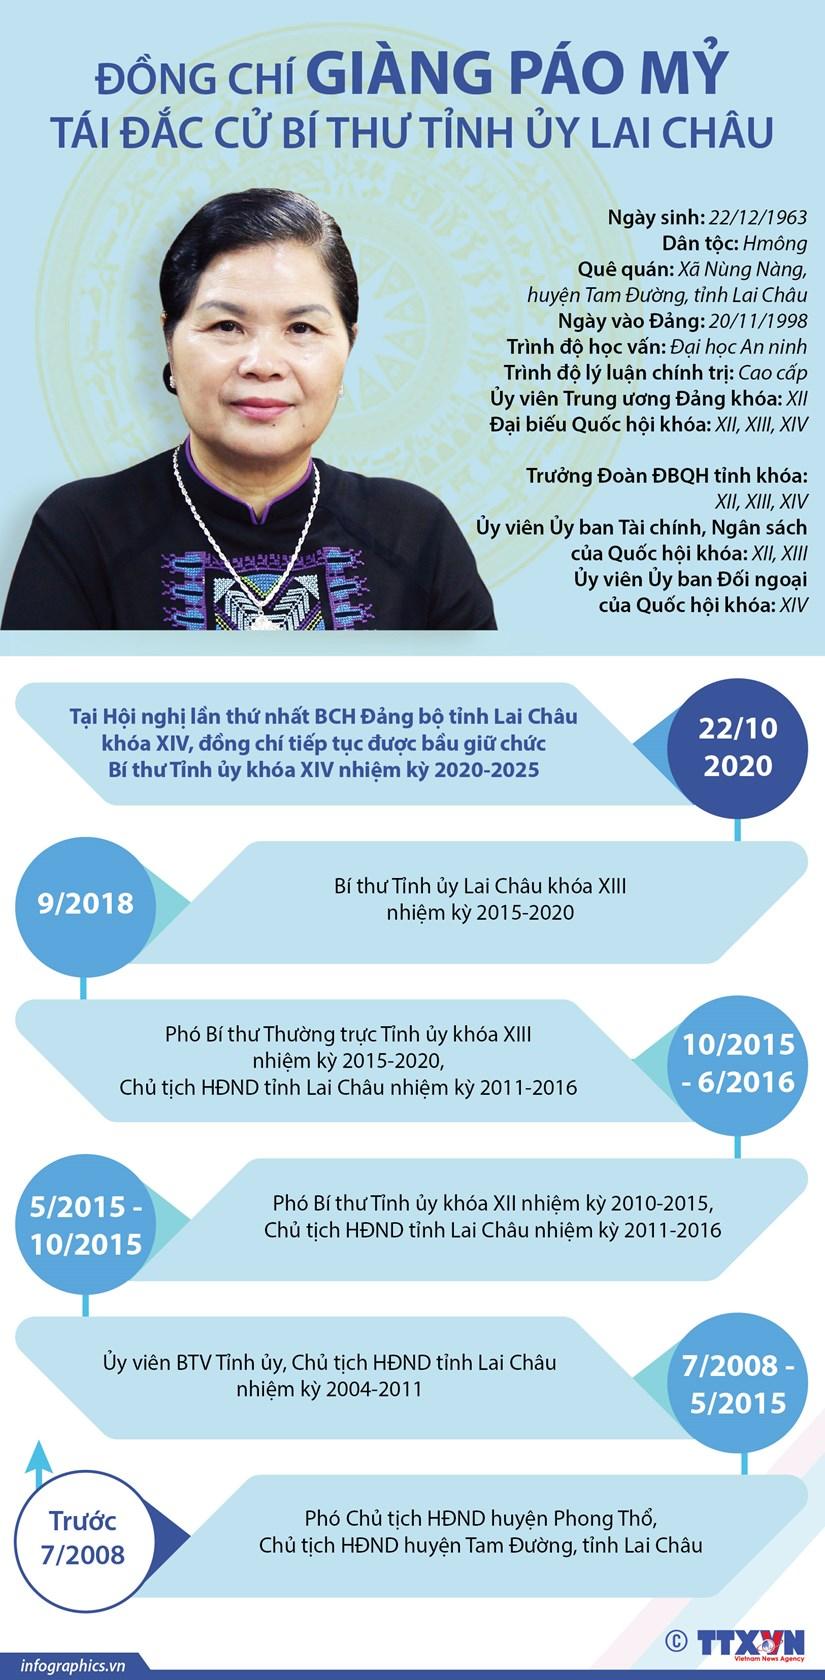 [Infographics] Bi thu Tinh uy Lai Chau khoa XIV Giang Pao My hinh anh 1